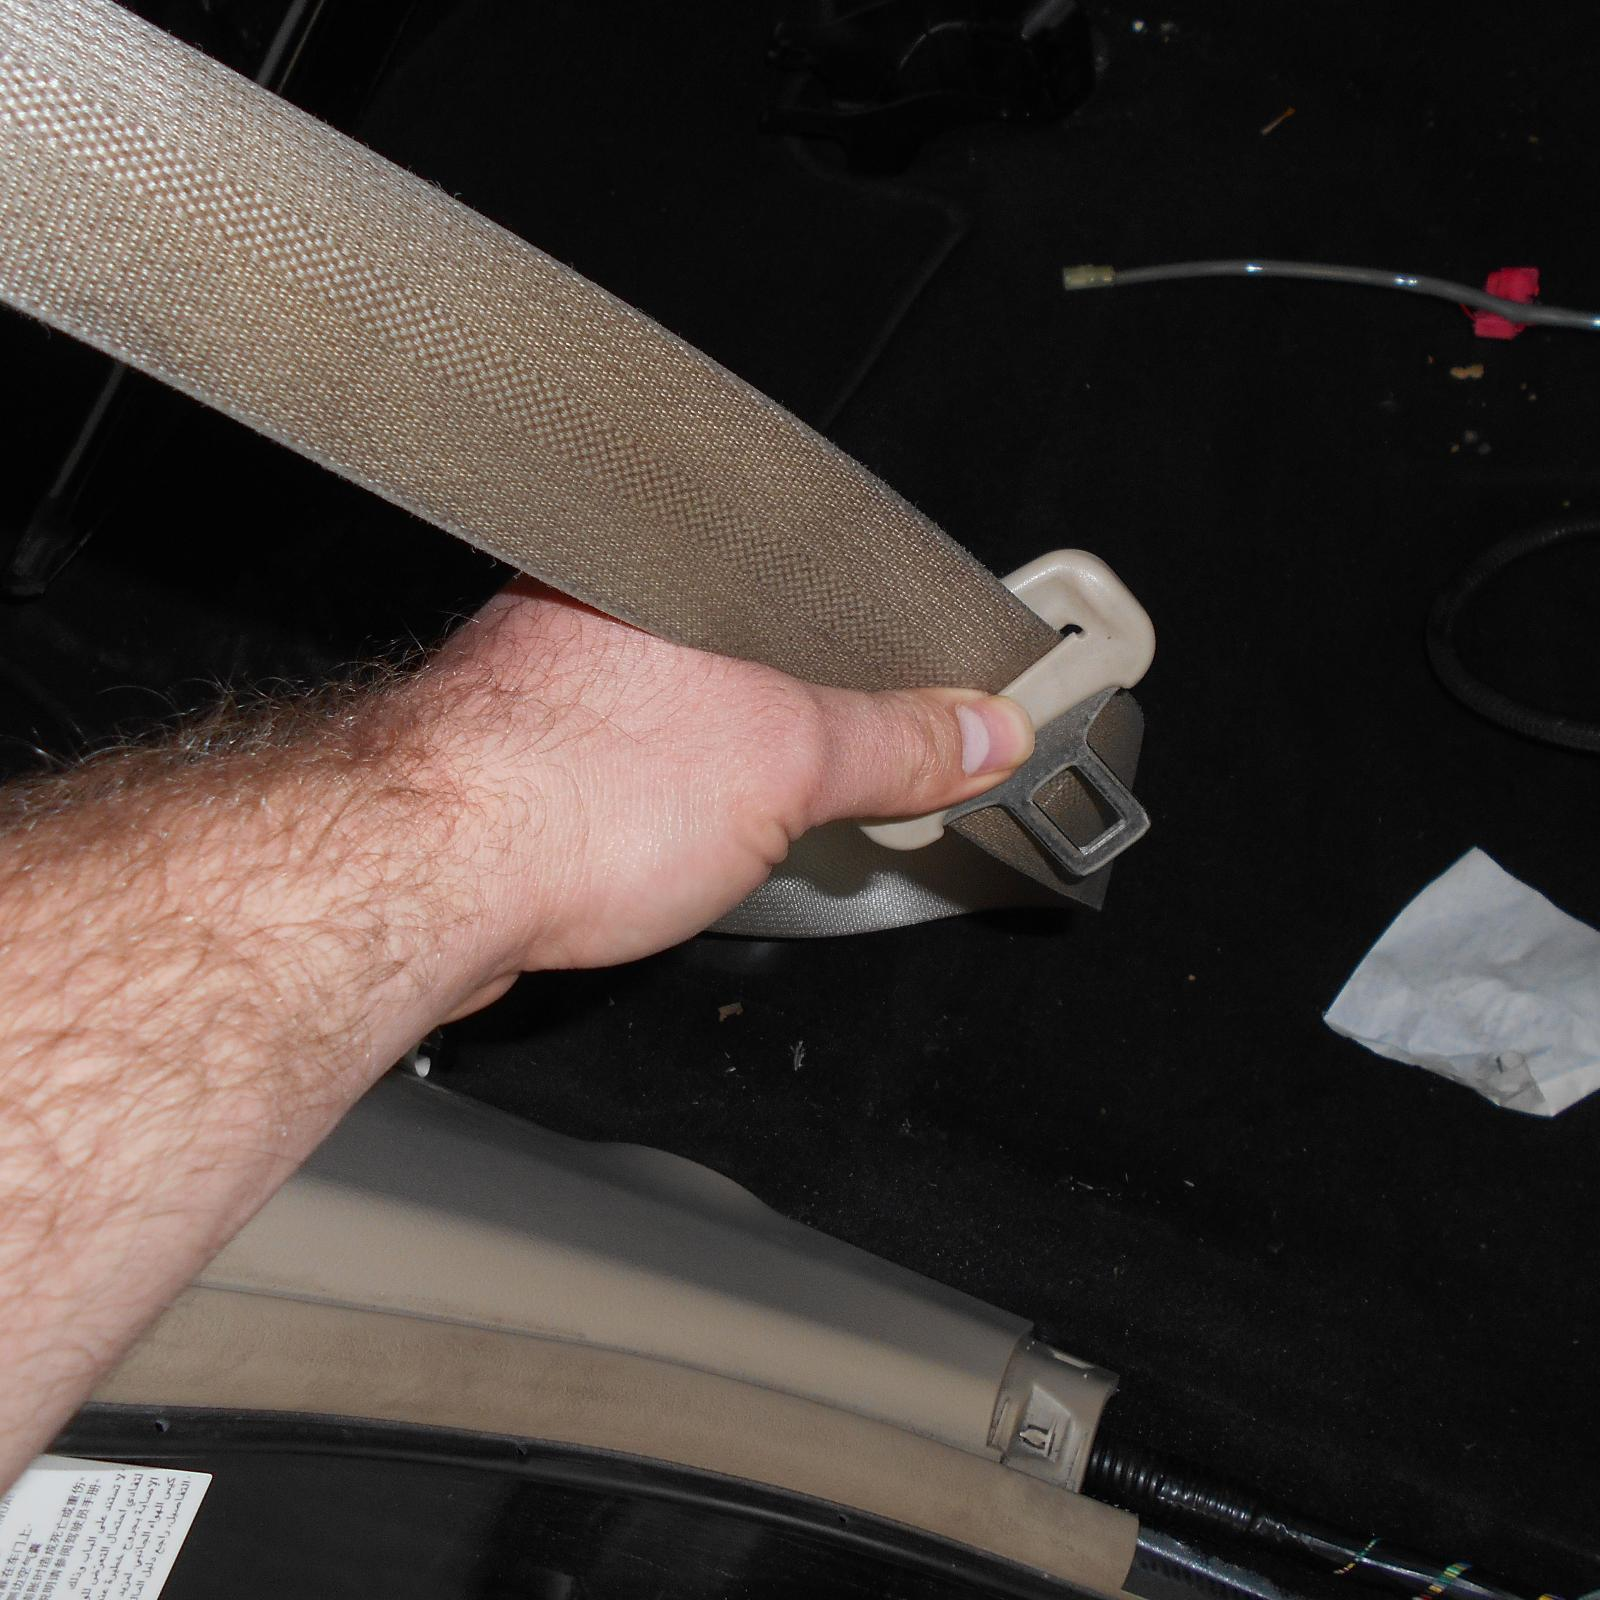 TOYOTA CAMRY, Seatbelt/Stalk, RH FRONT, SEAT BELT STALK ONLY, ASV50/AVV50, 12/11-10/17